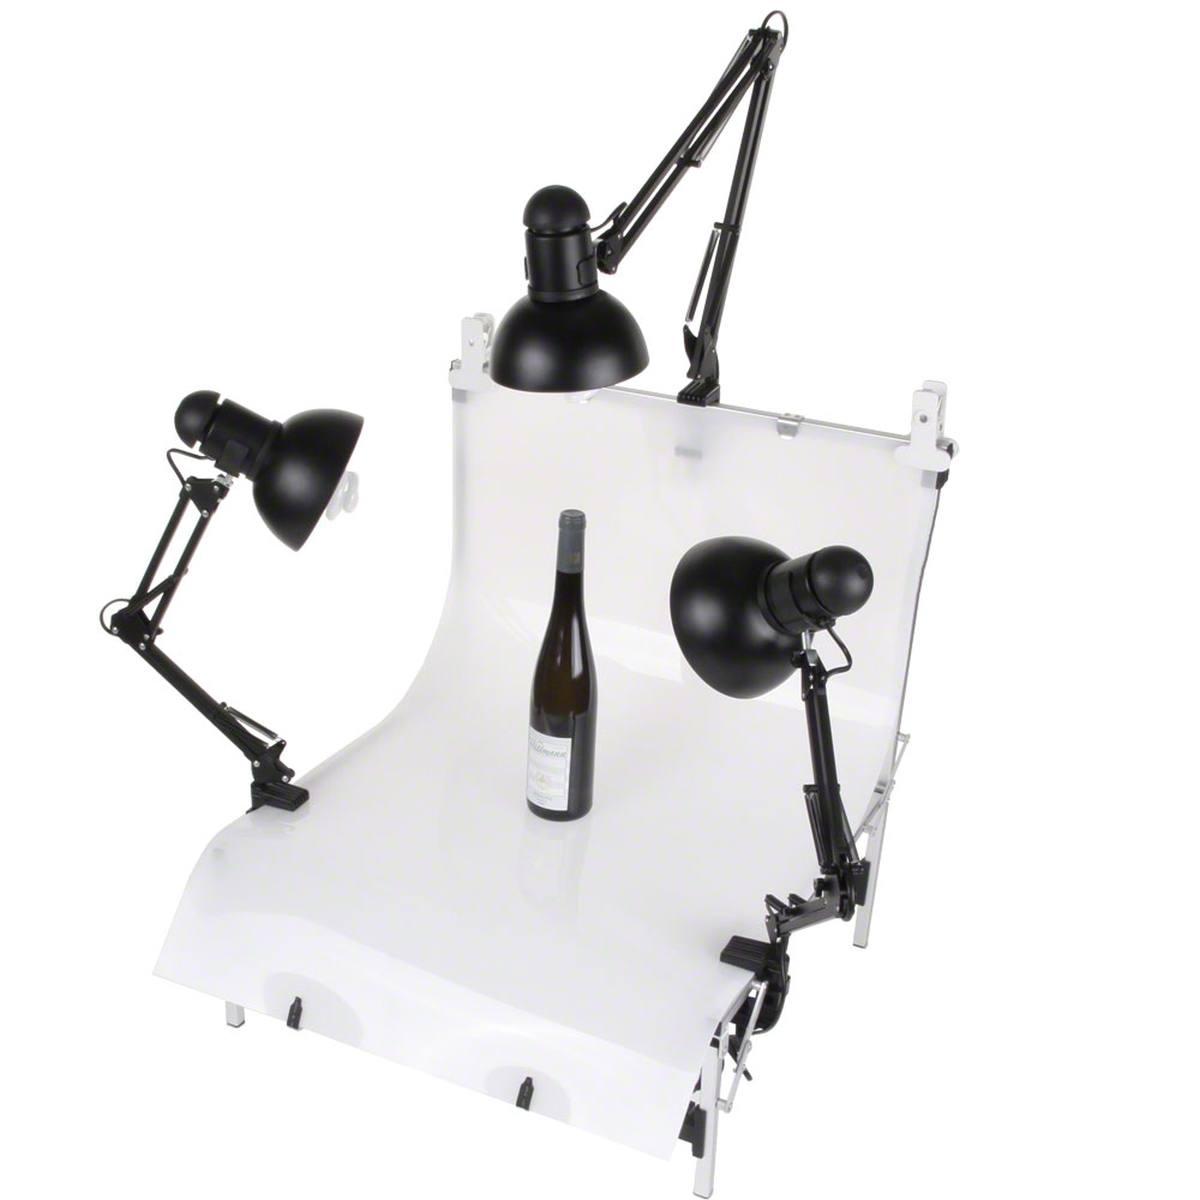 Walimex Set 3 Daylights, 3x 25W + Shooting Table